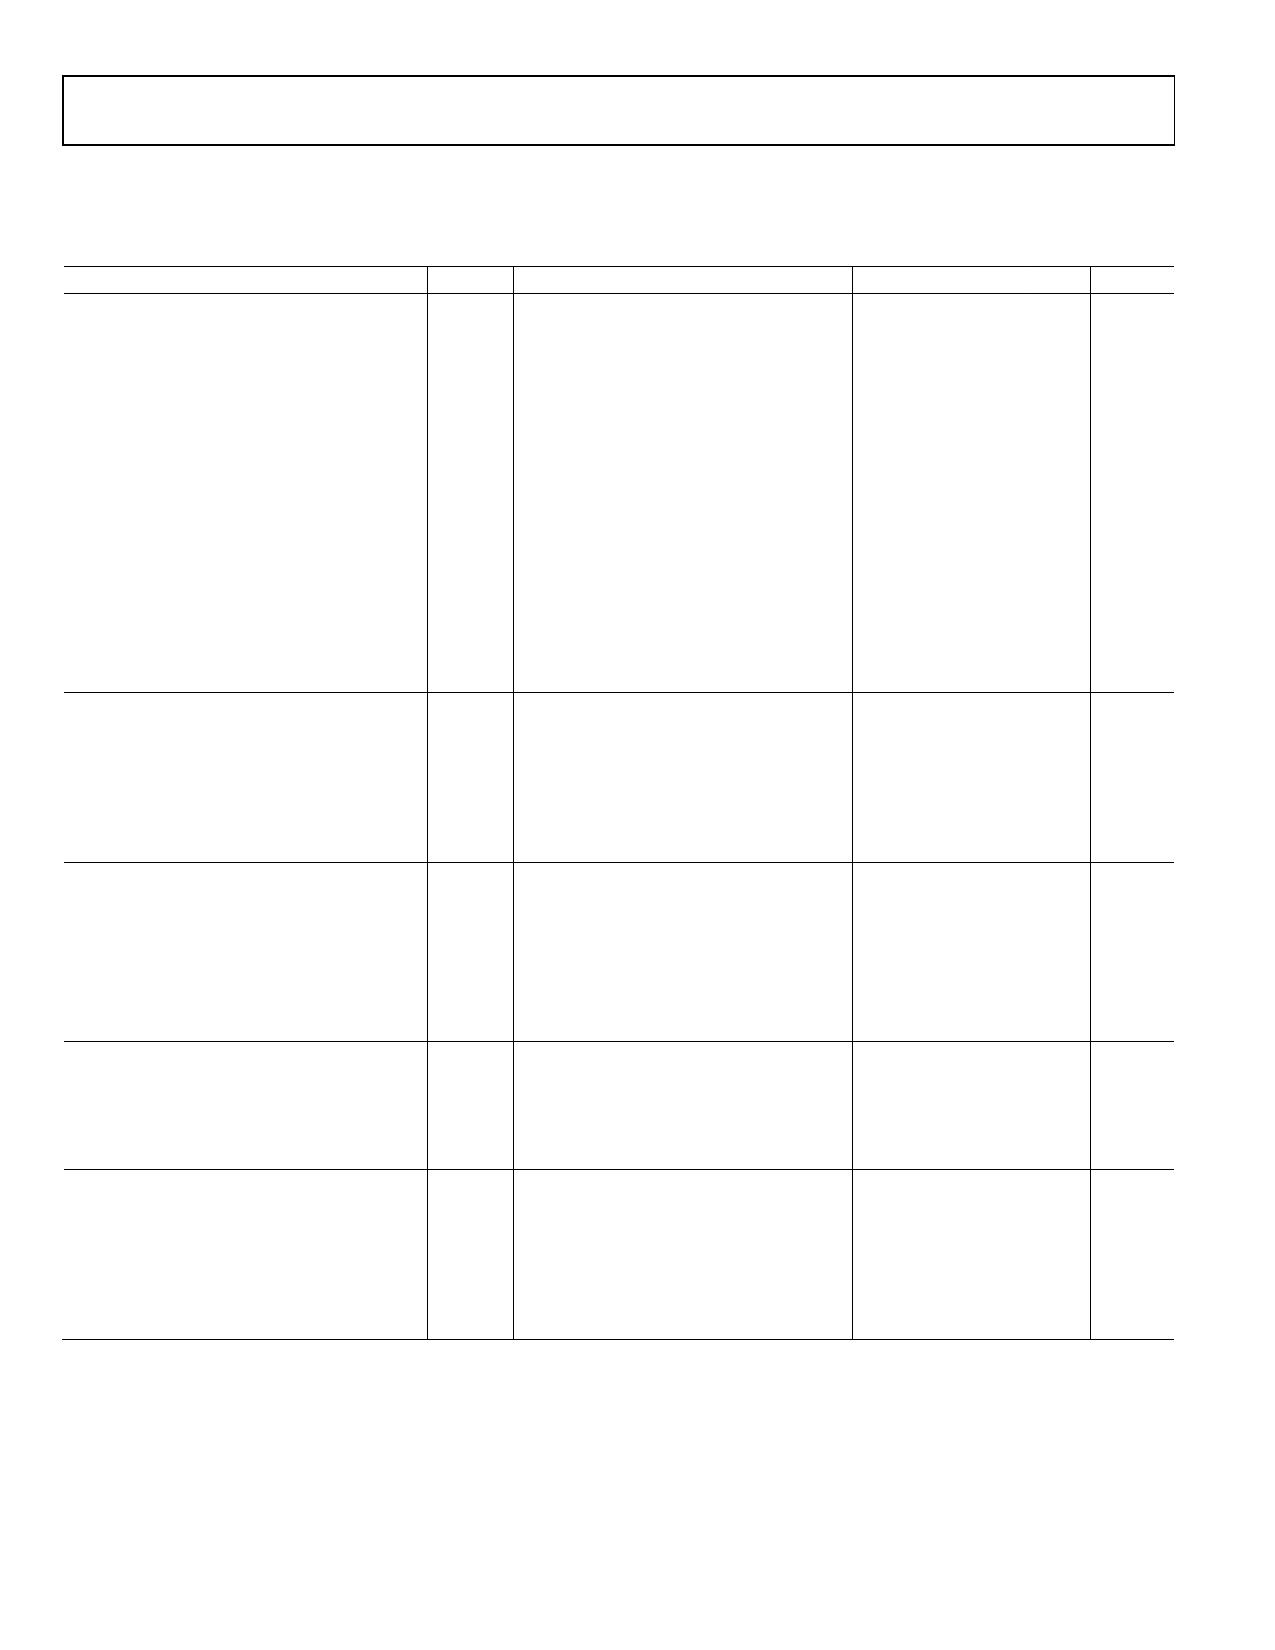 AD5160 pdf, arduino